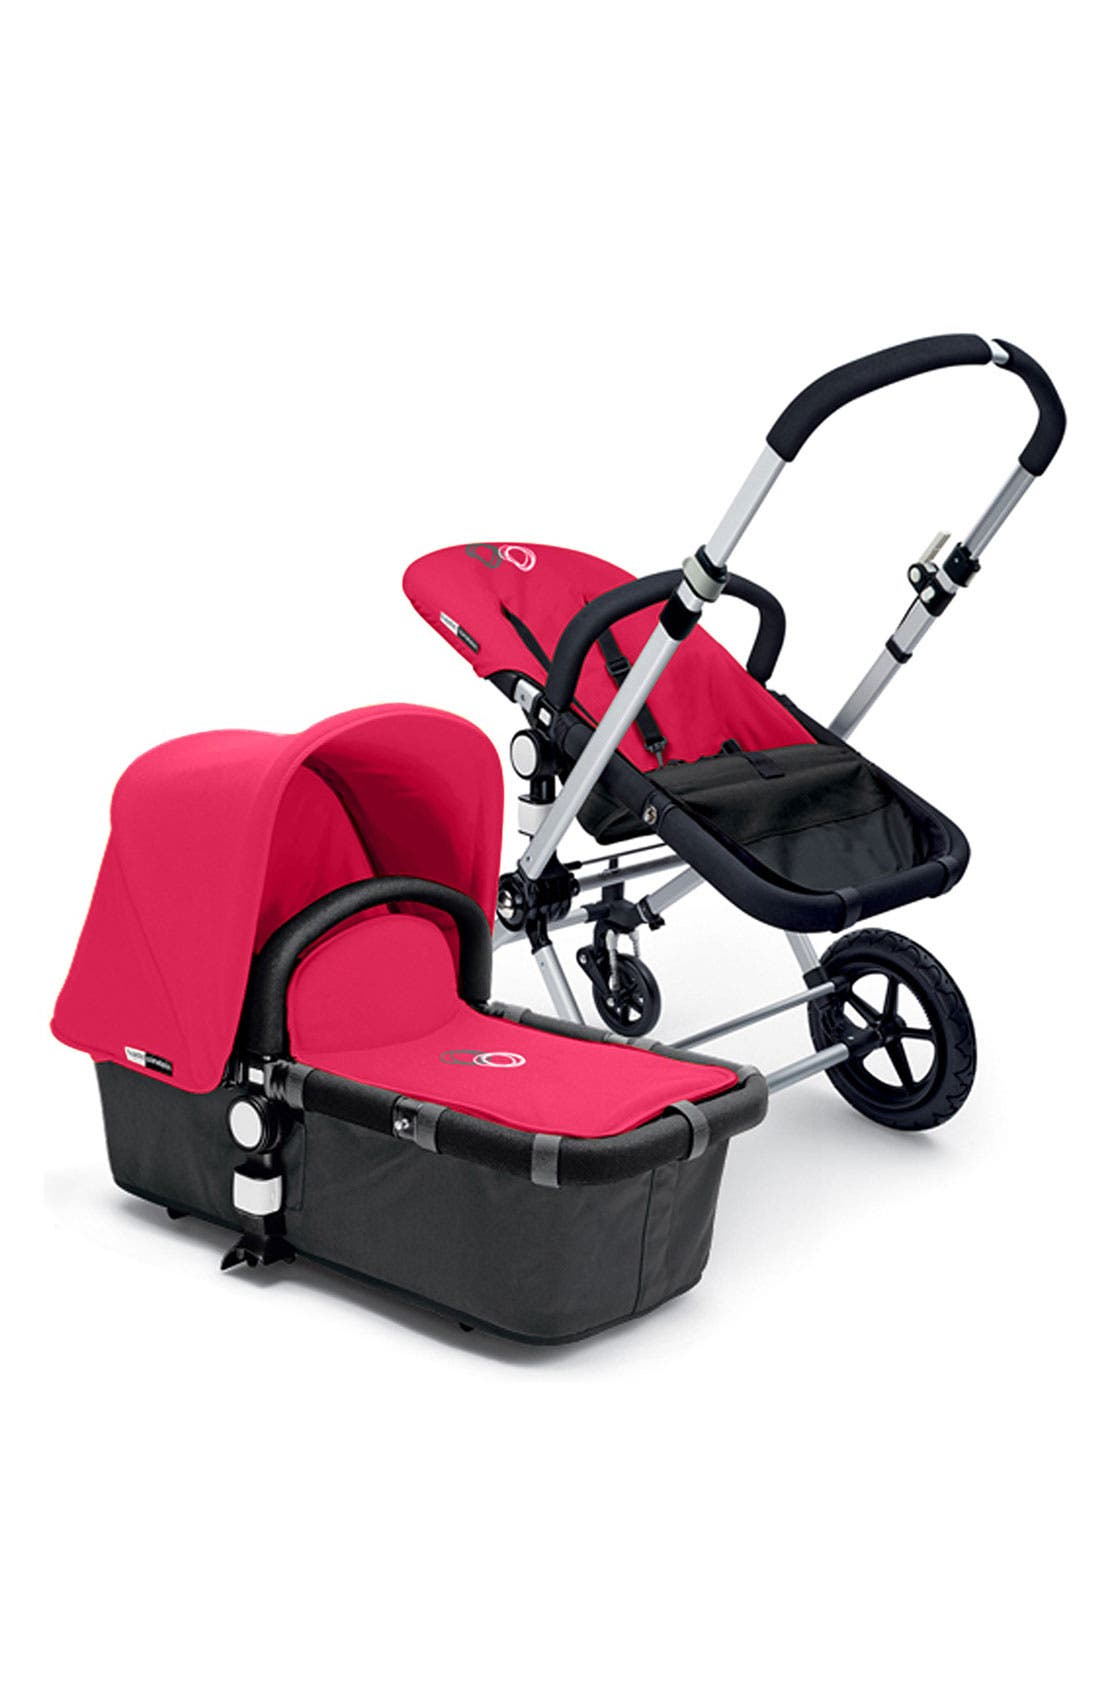 Alternate Image 1 Selected - Bugaboo 'Cameleon' Tailored Canvas Stroller Set